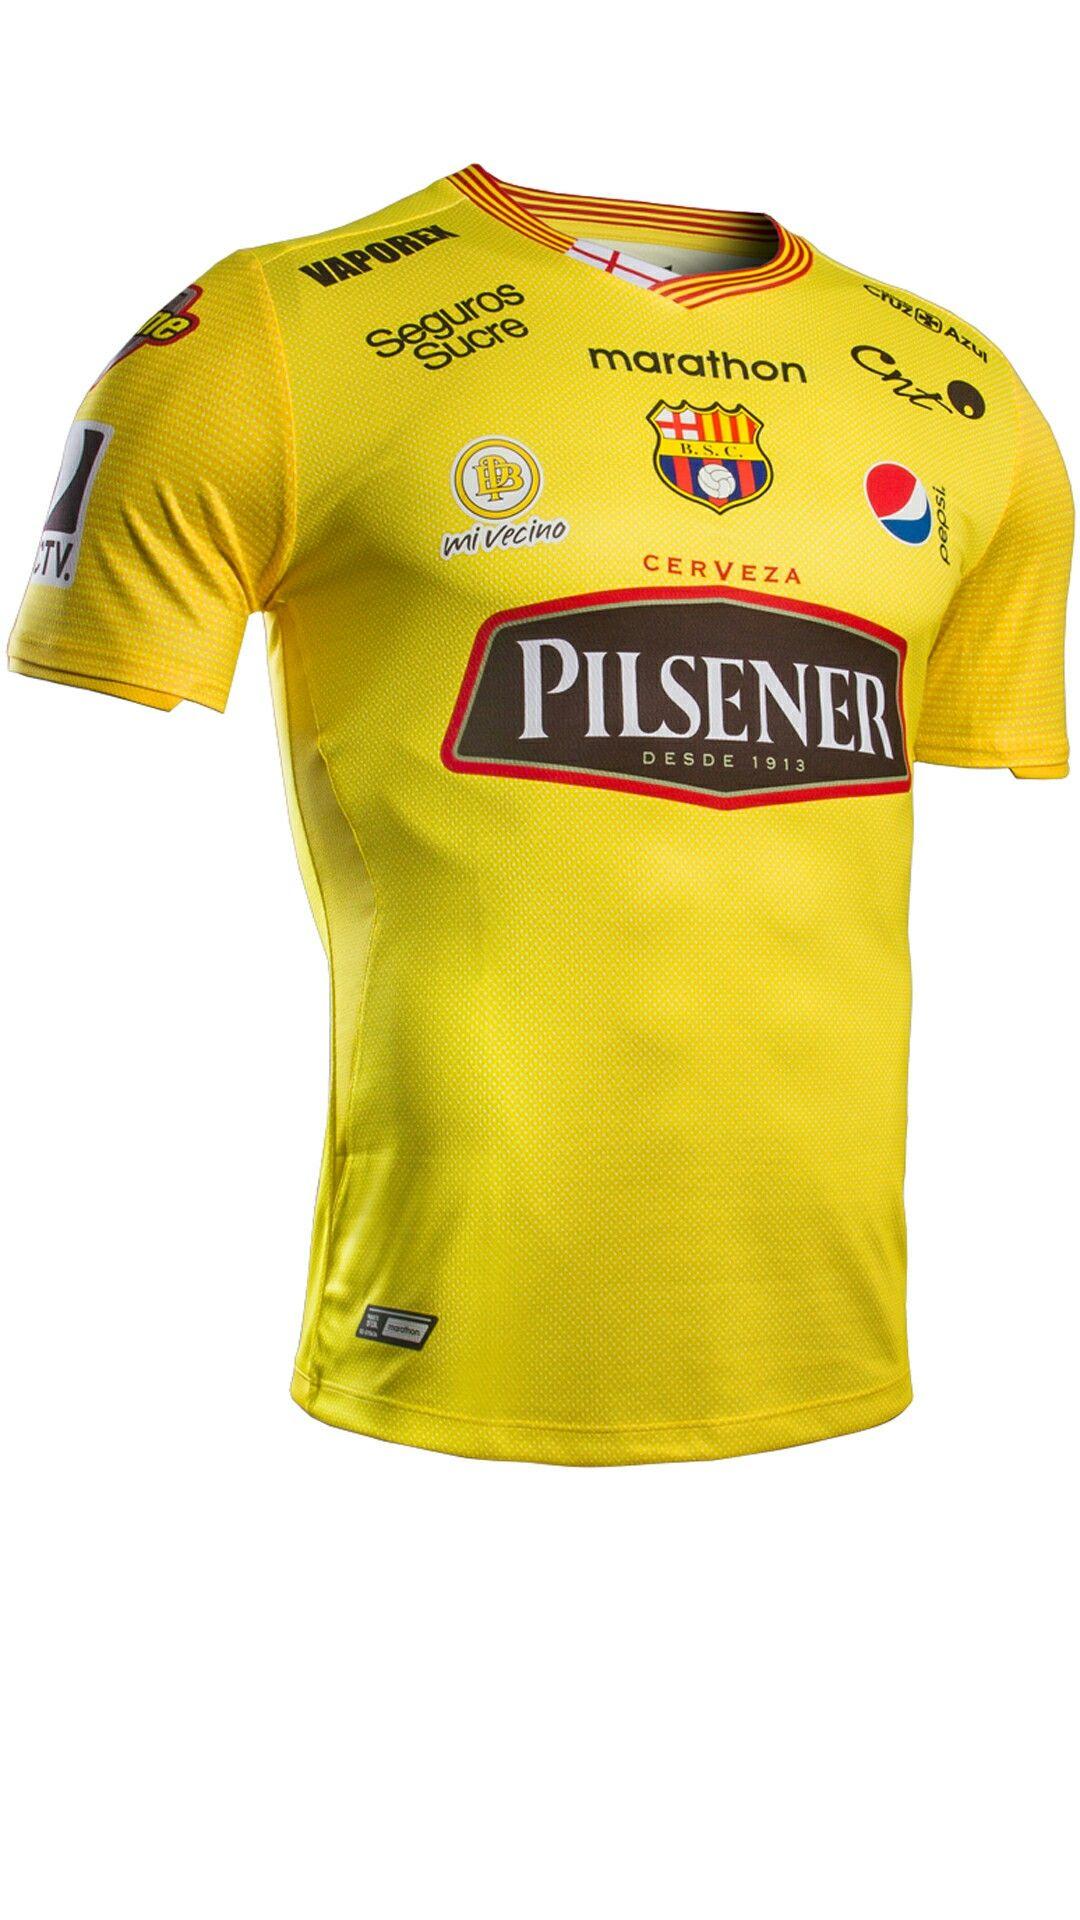 Camiseta Oficial 2018 de Barcelona Sporting Club x Marathon Sports ... b430119ff8882